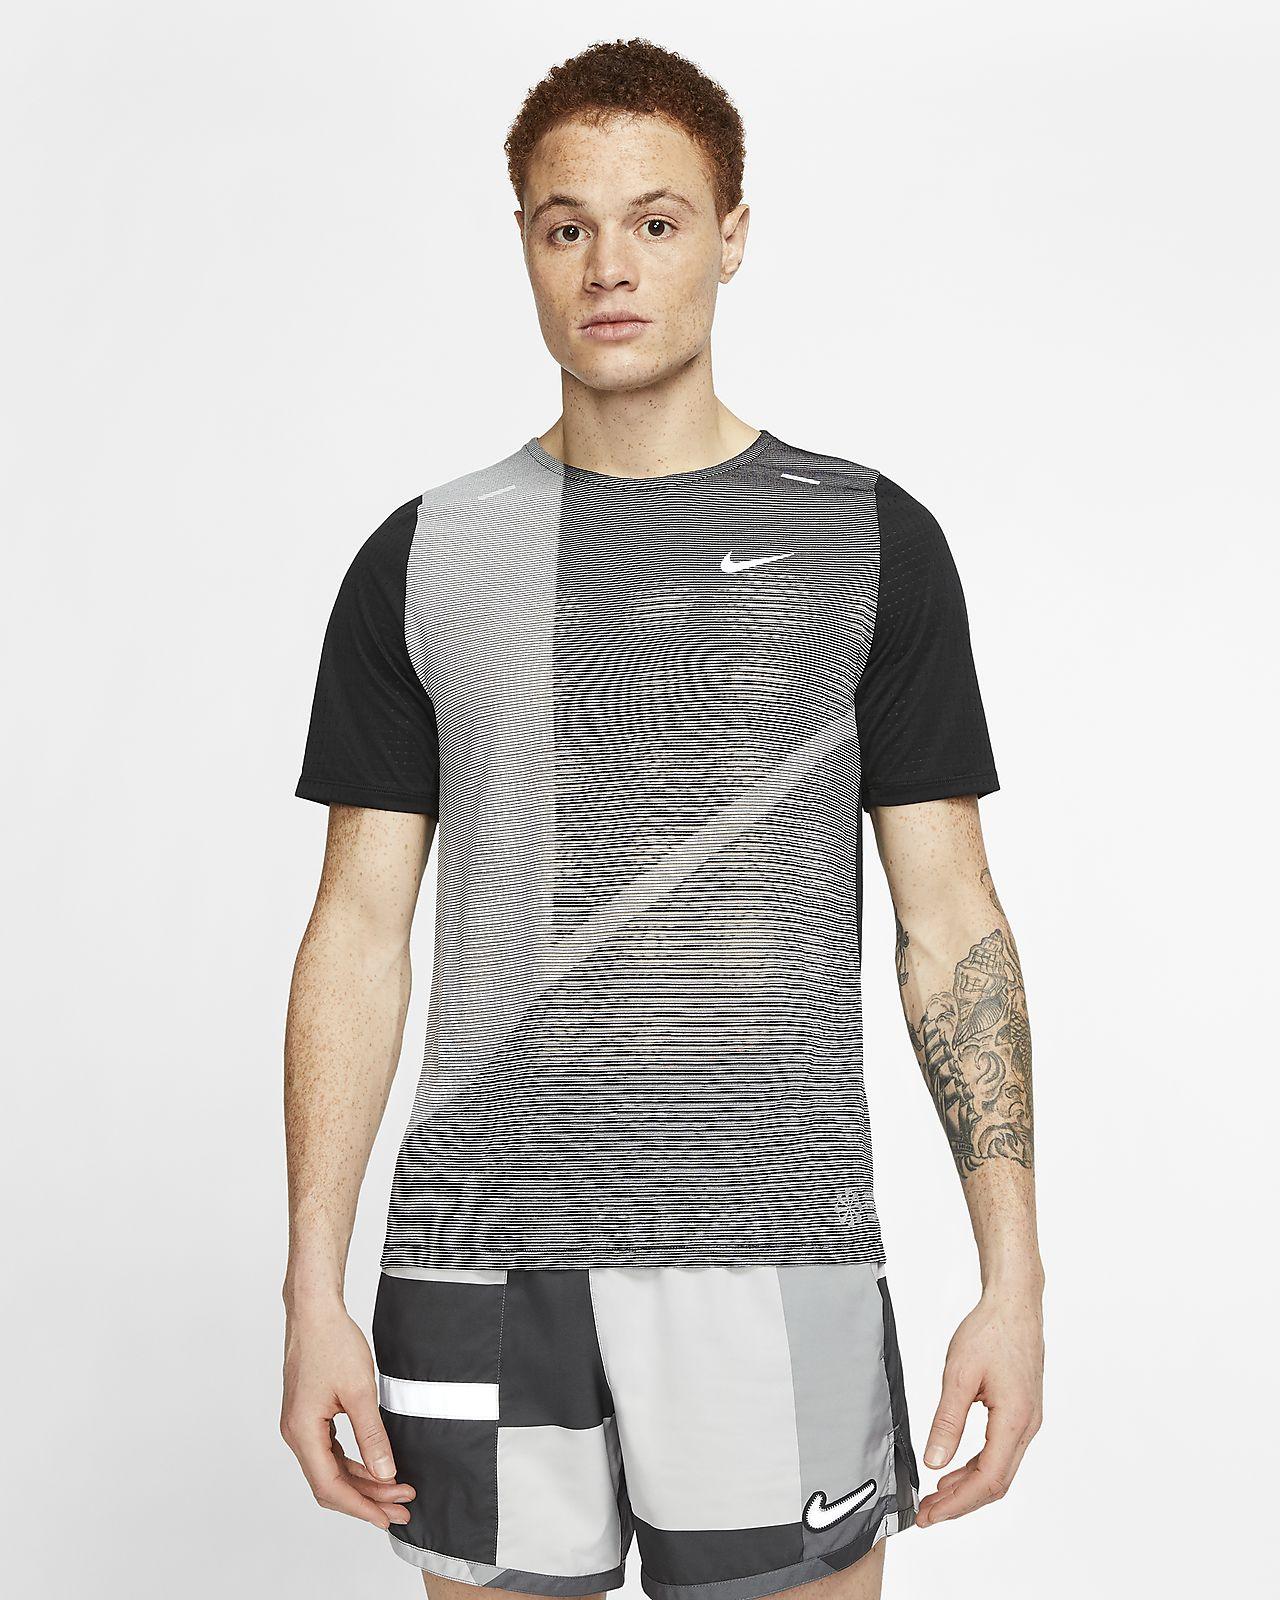 Prenda para la parte superior de running para hombre Nike Rise 365 Future Fast